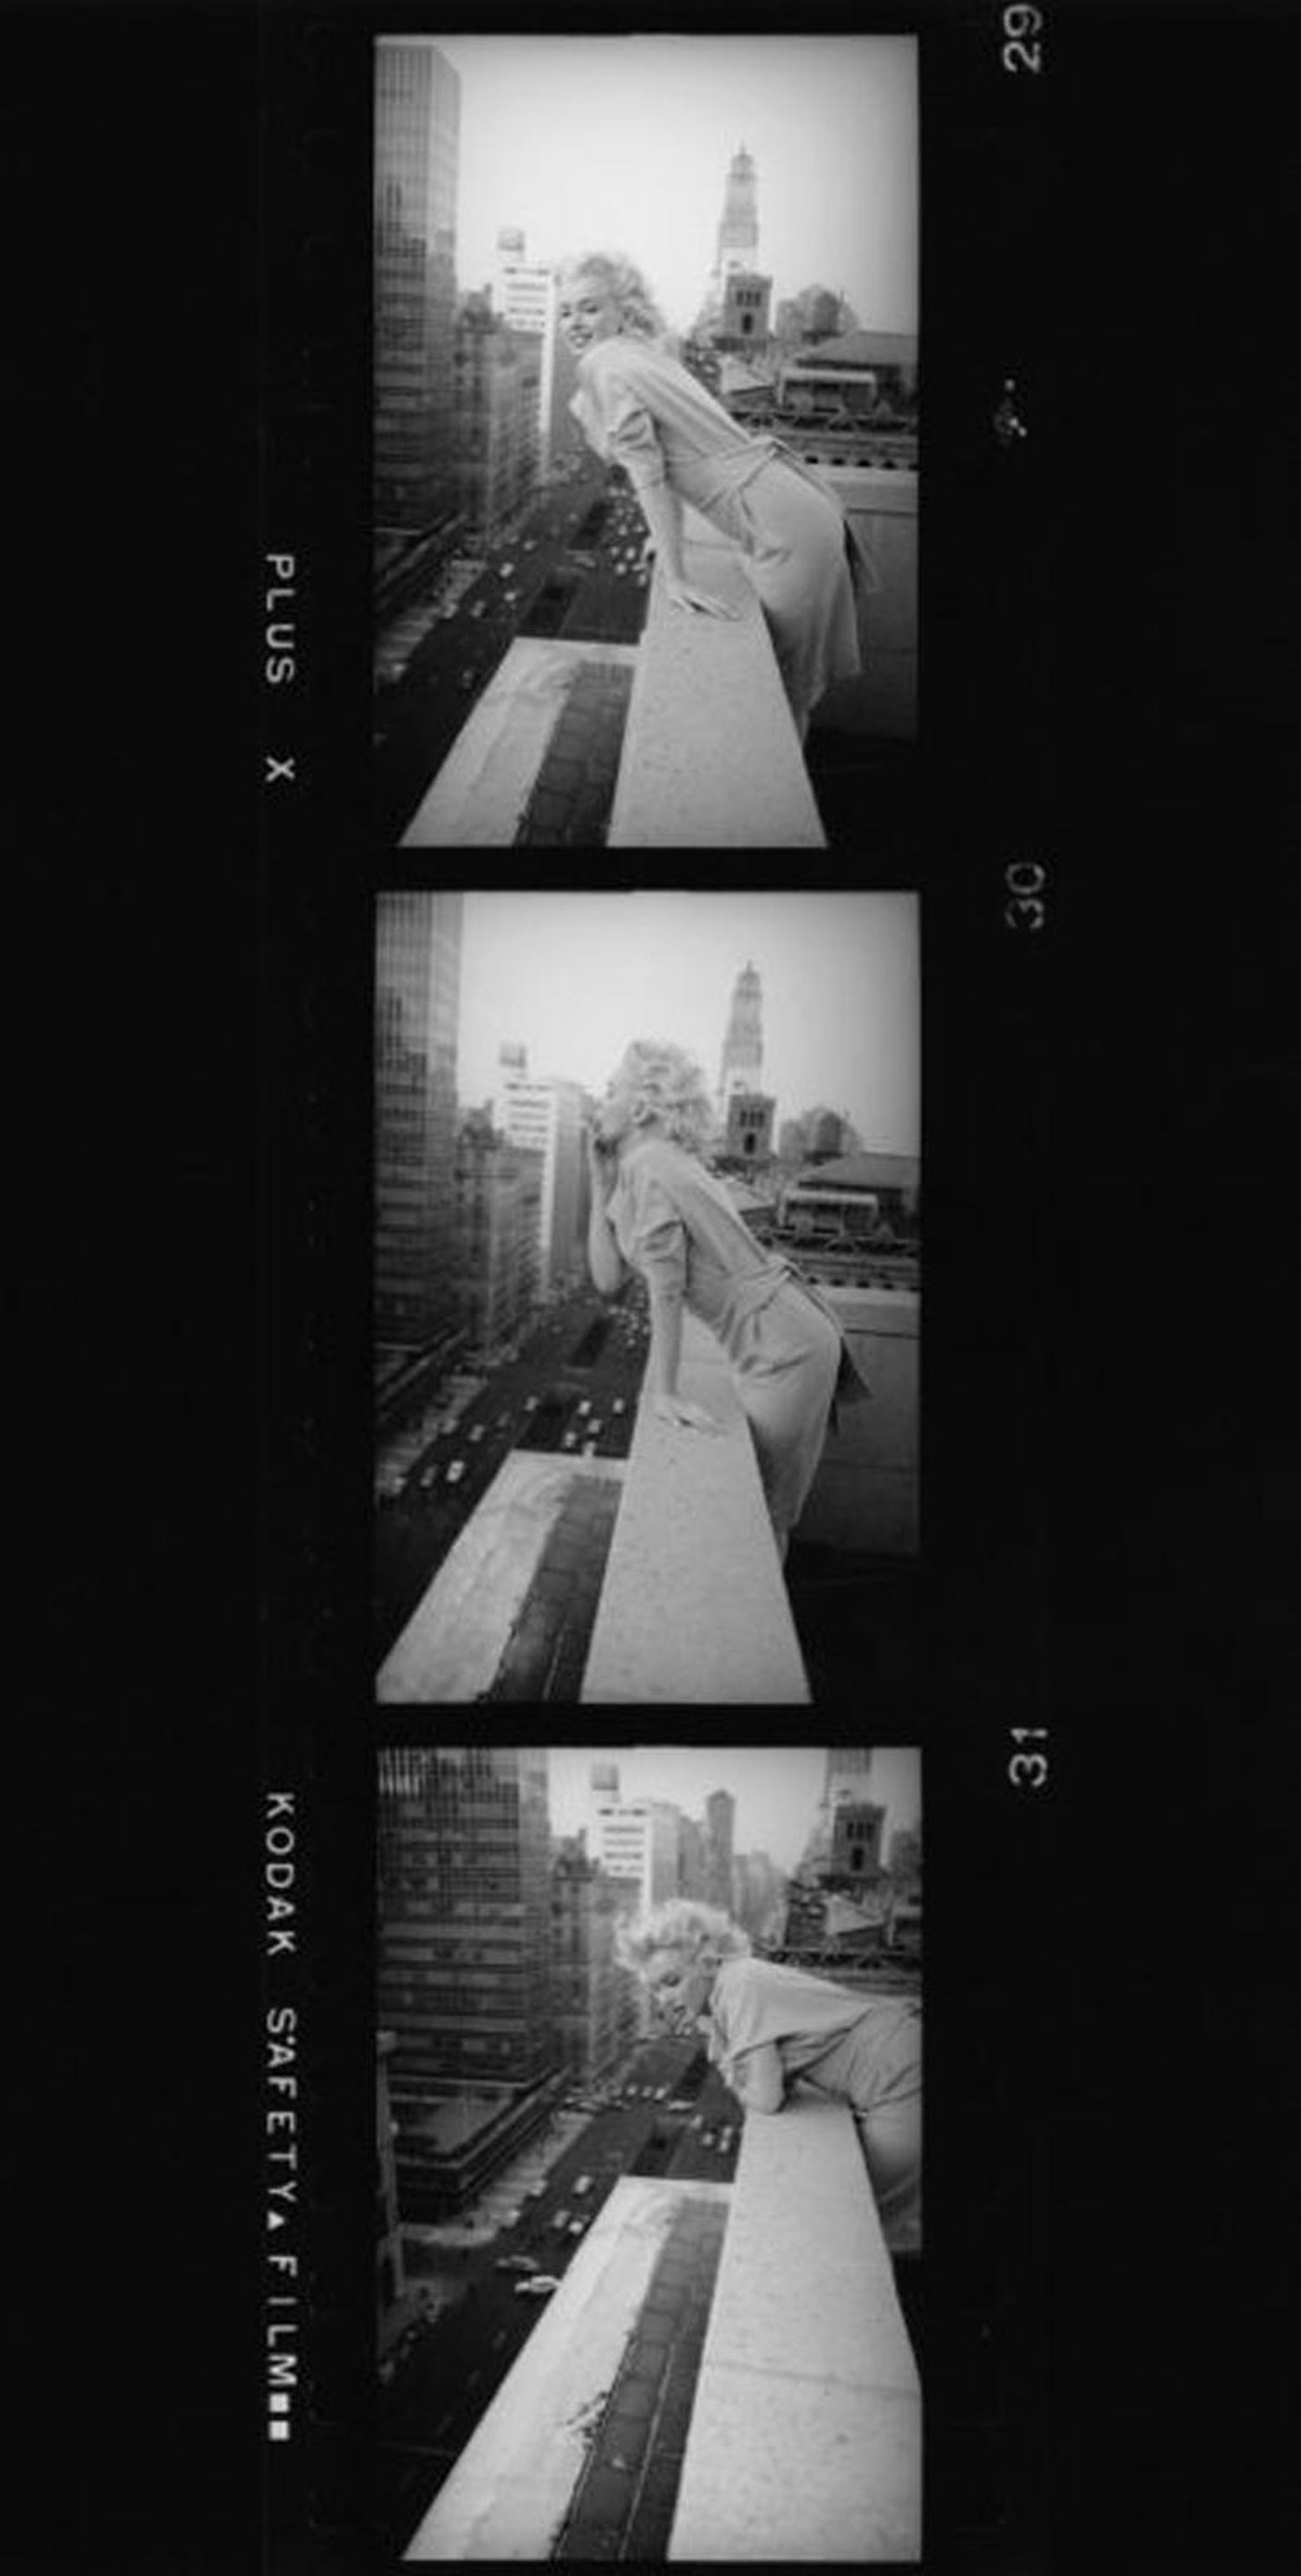 Ed Feingersh Marilyn Monroe Contact Strip For Sale At 1stdibs